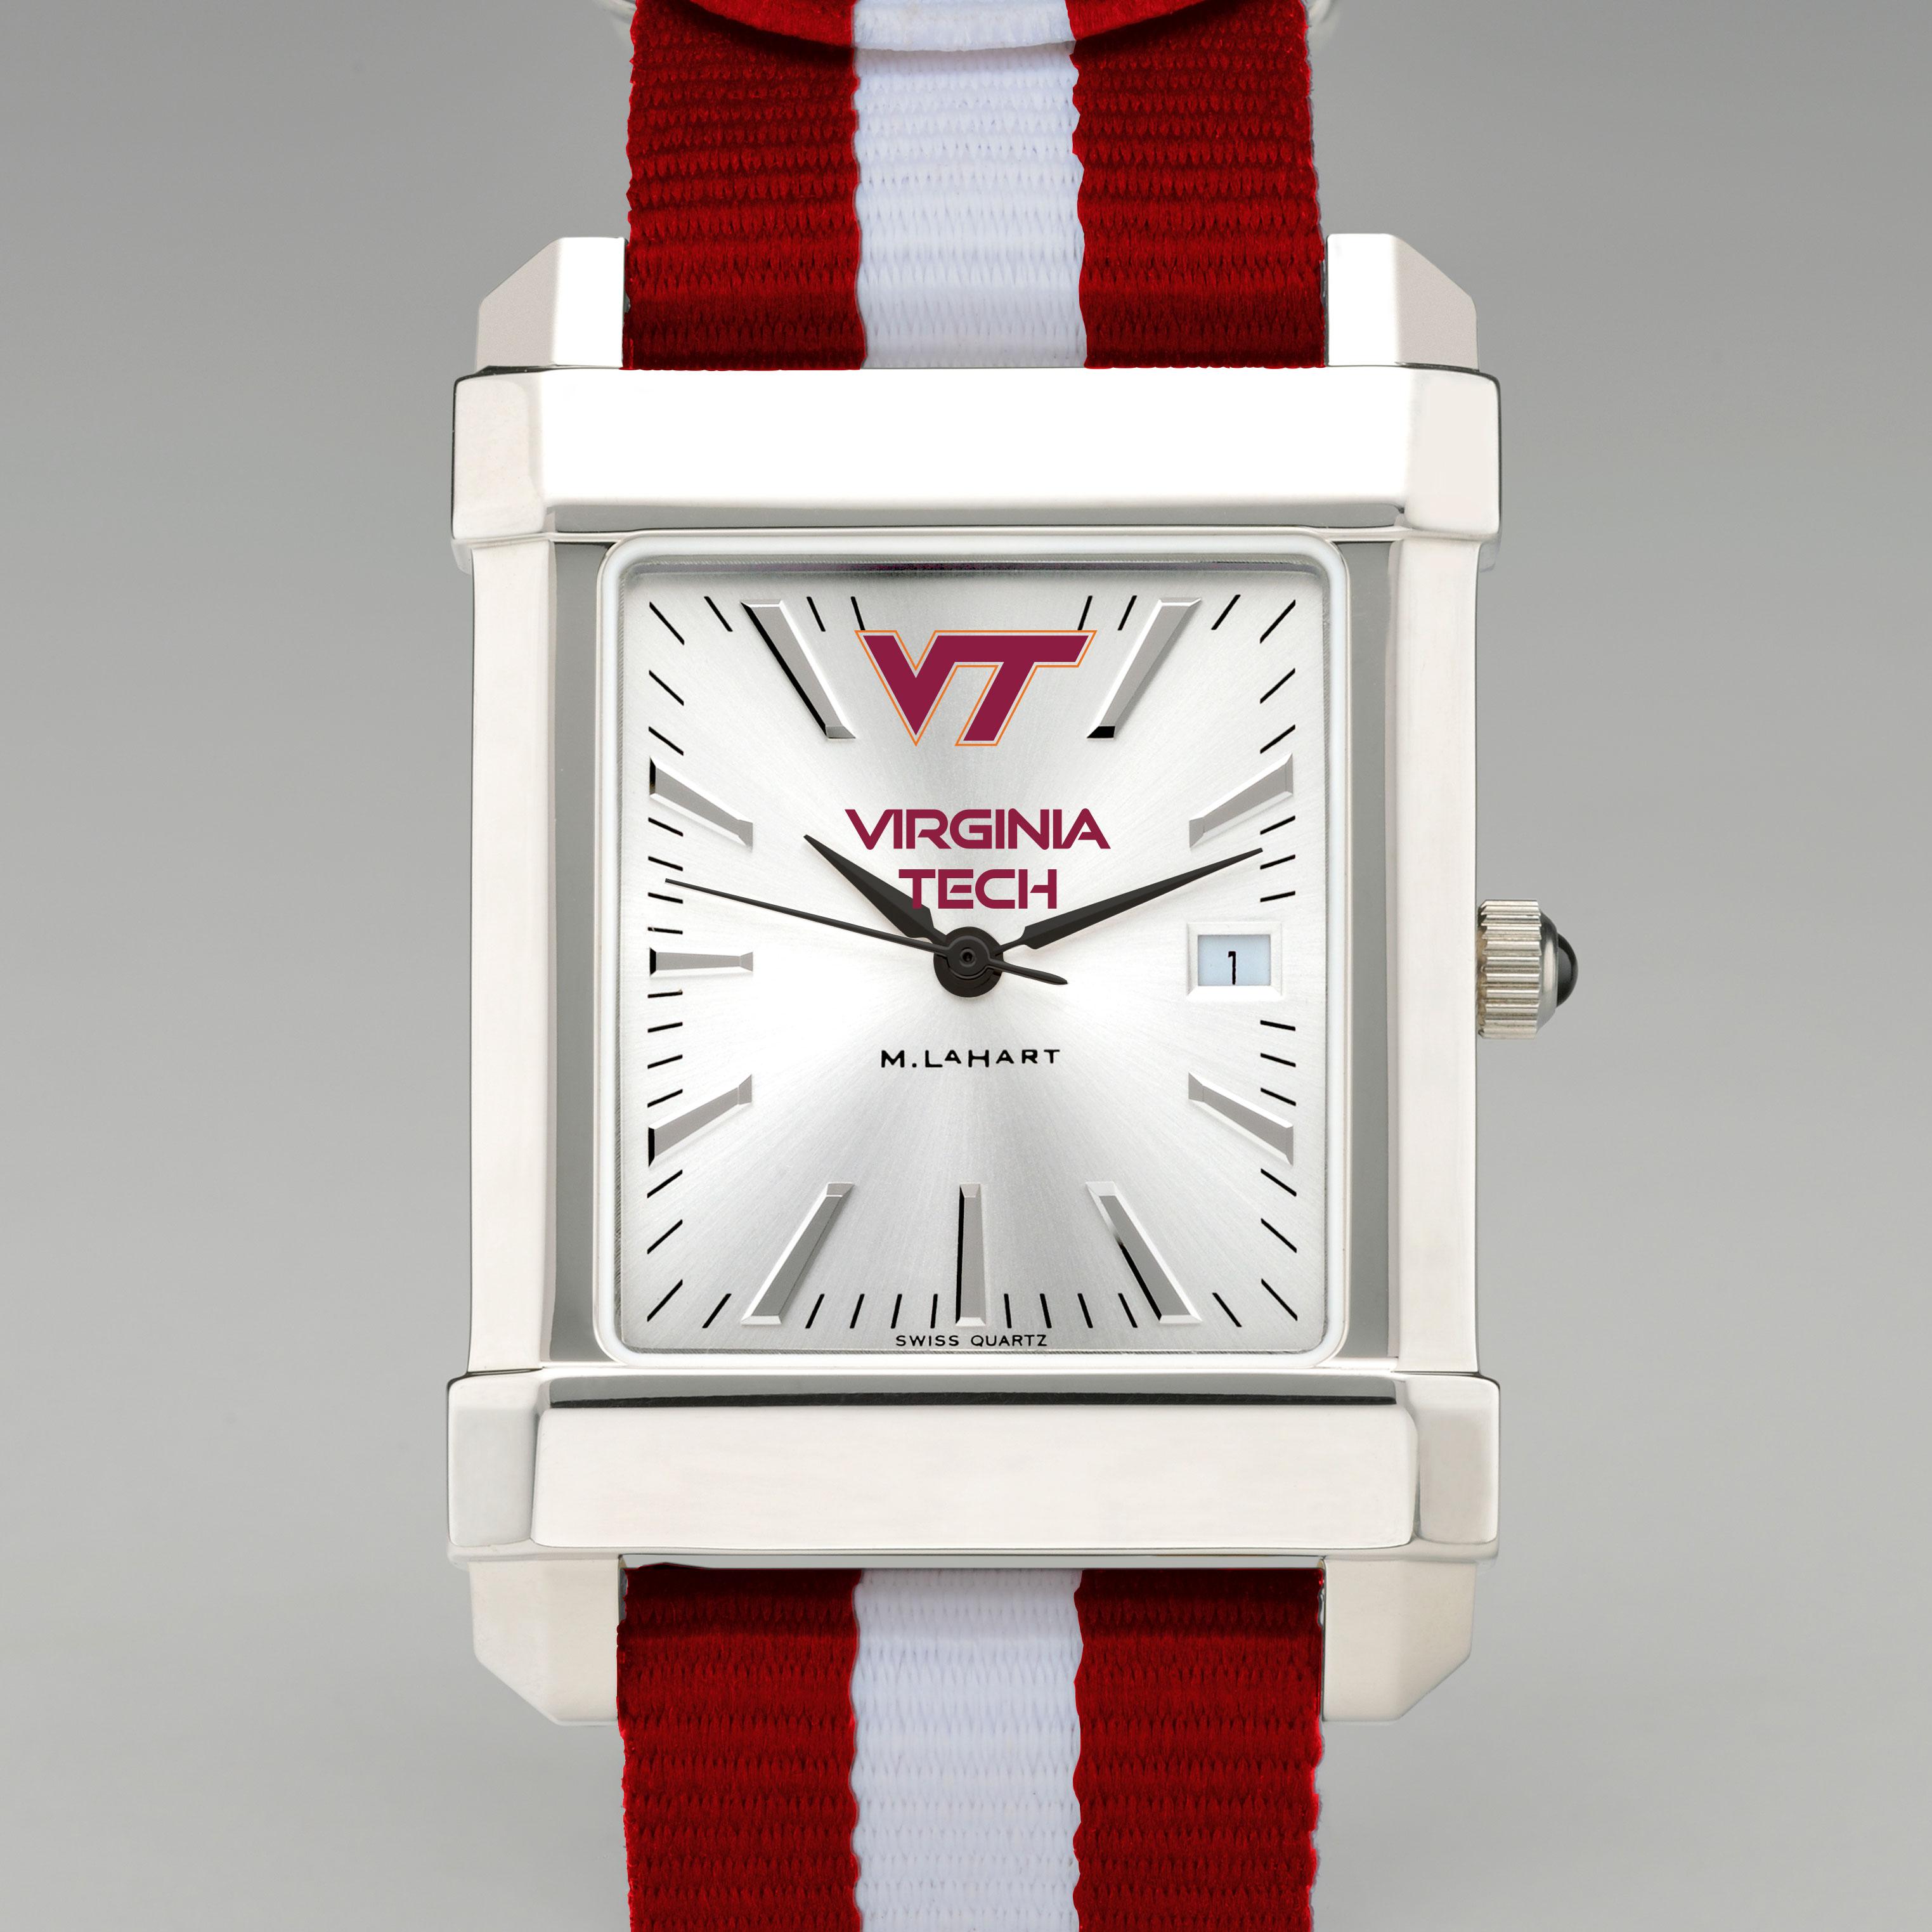 Virginia Tech Collegiate Watch with NATO Strap for Men